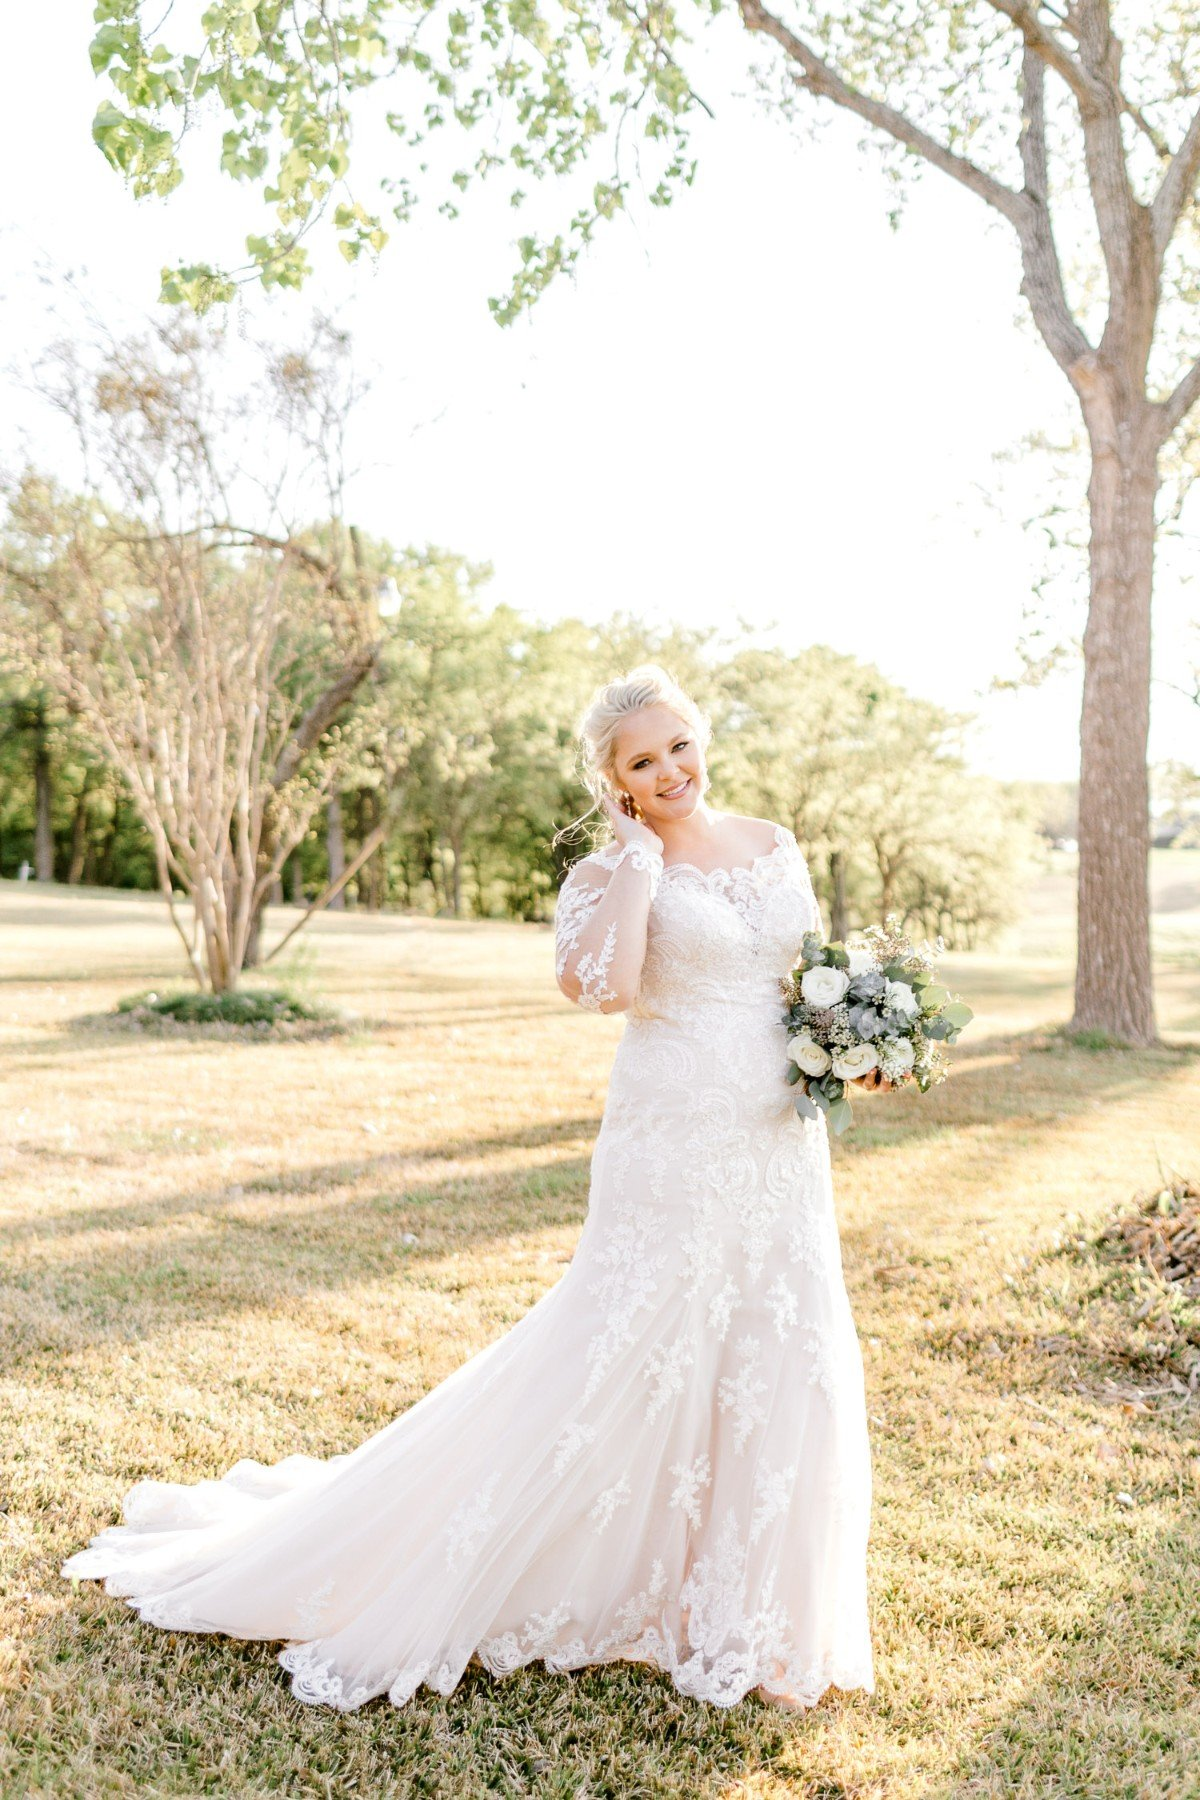 casidy-bridals-tradinghouse-lake-waco-wedding-photographer-kaitlyn-bullard-09.jpg